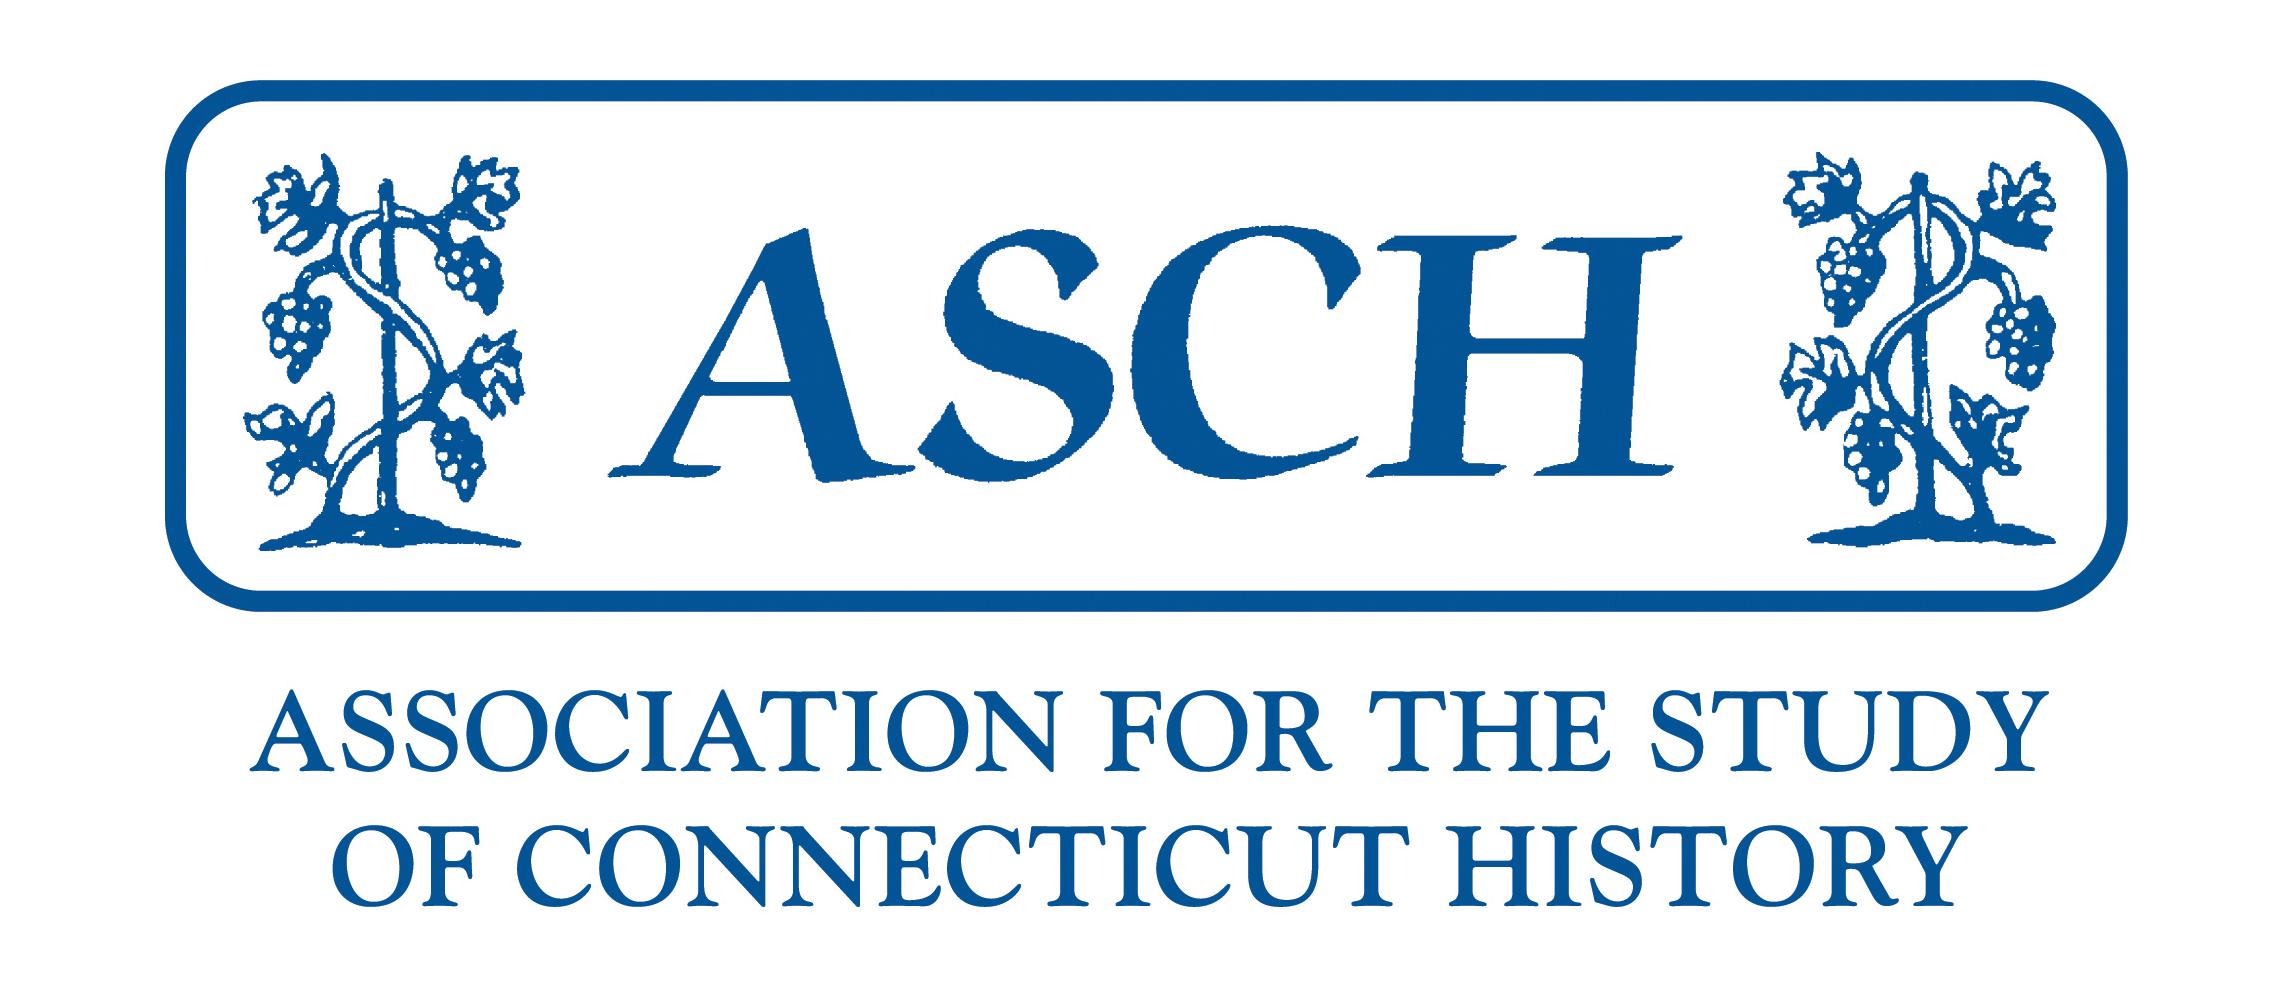 asch-full-logo